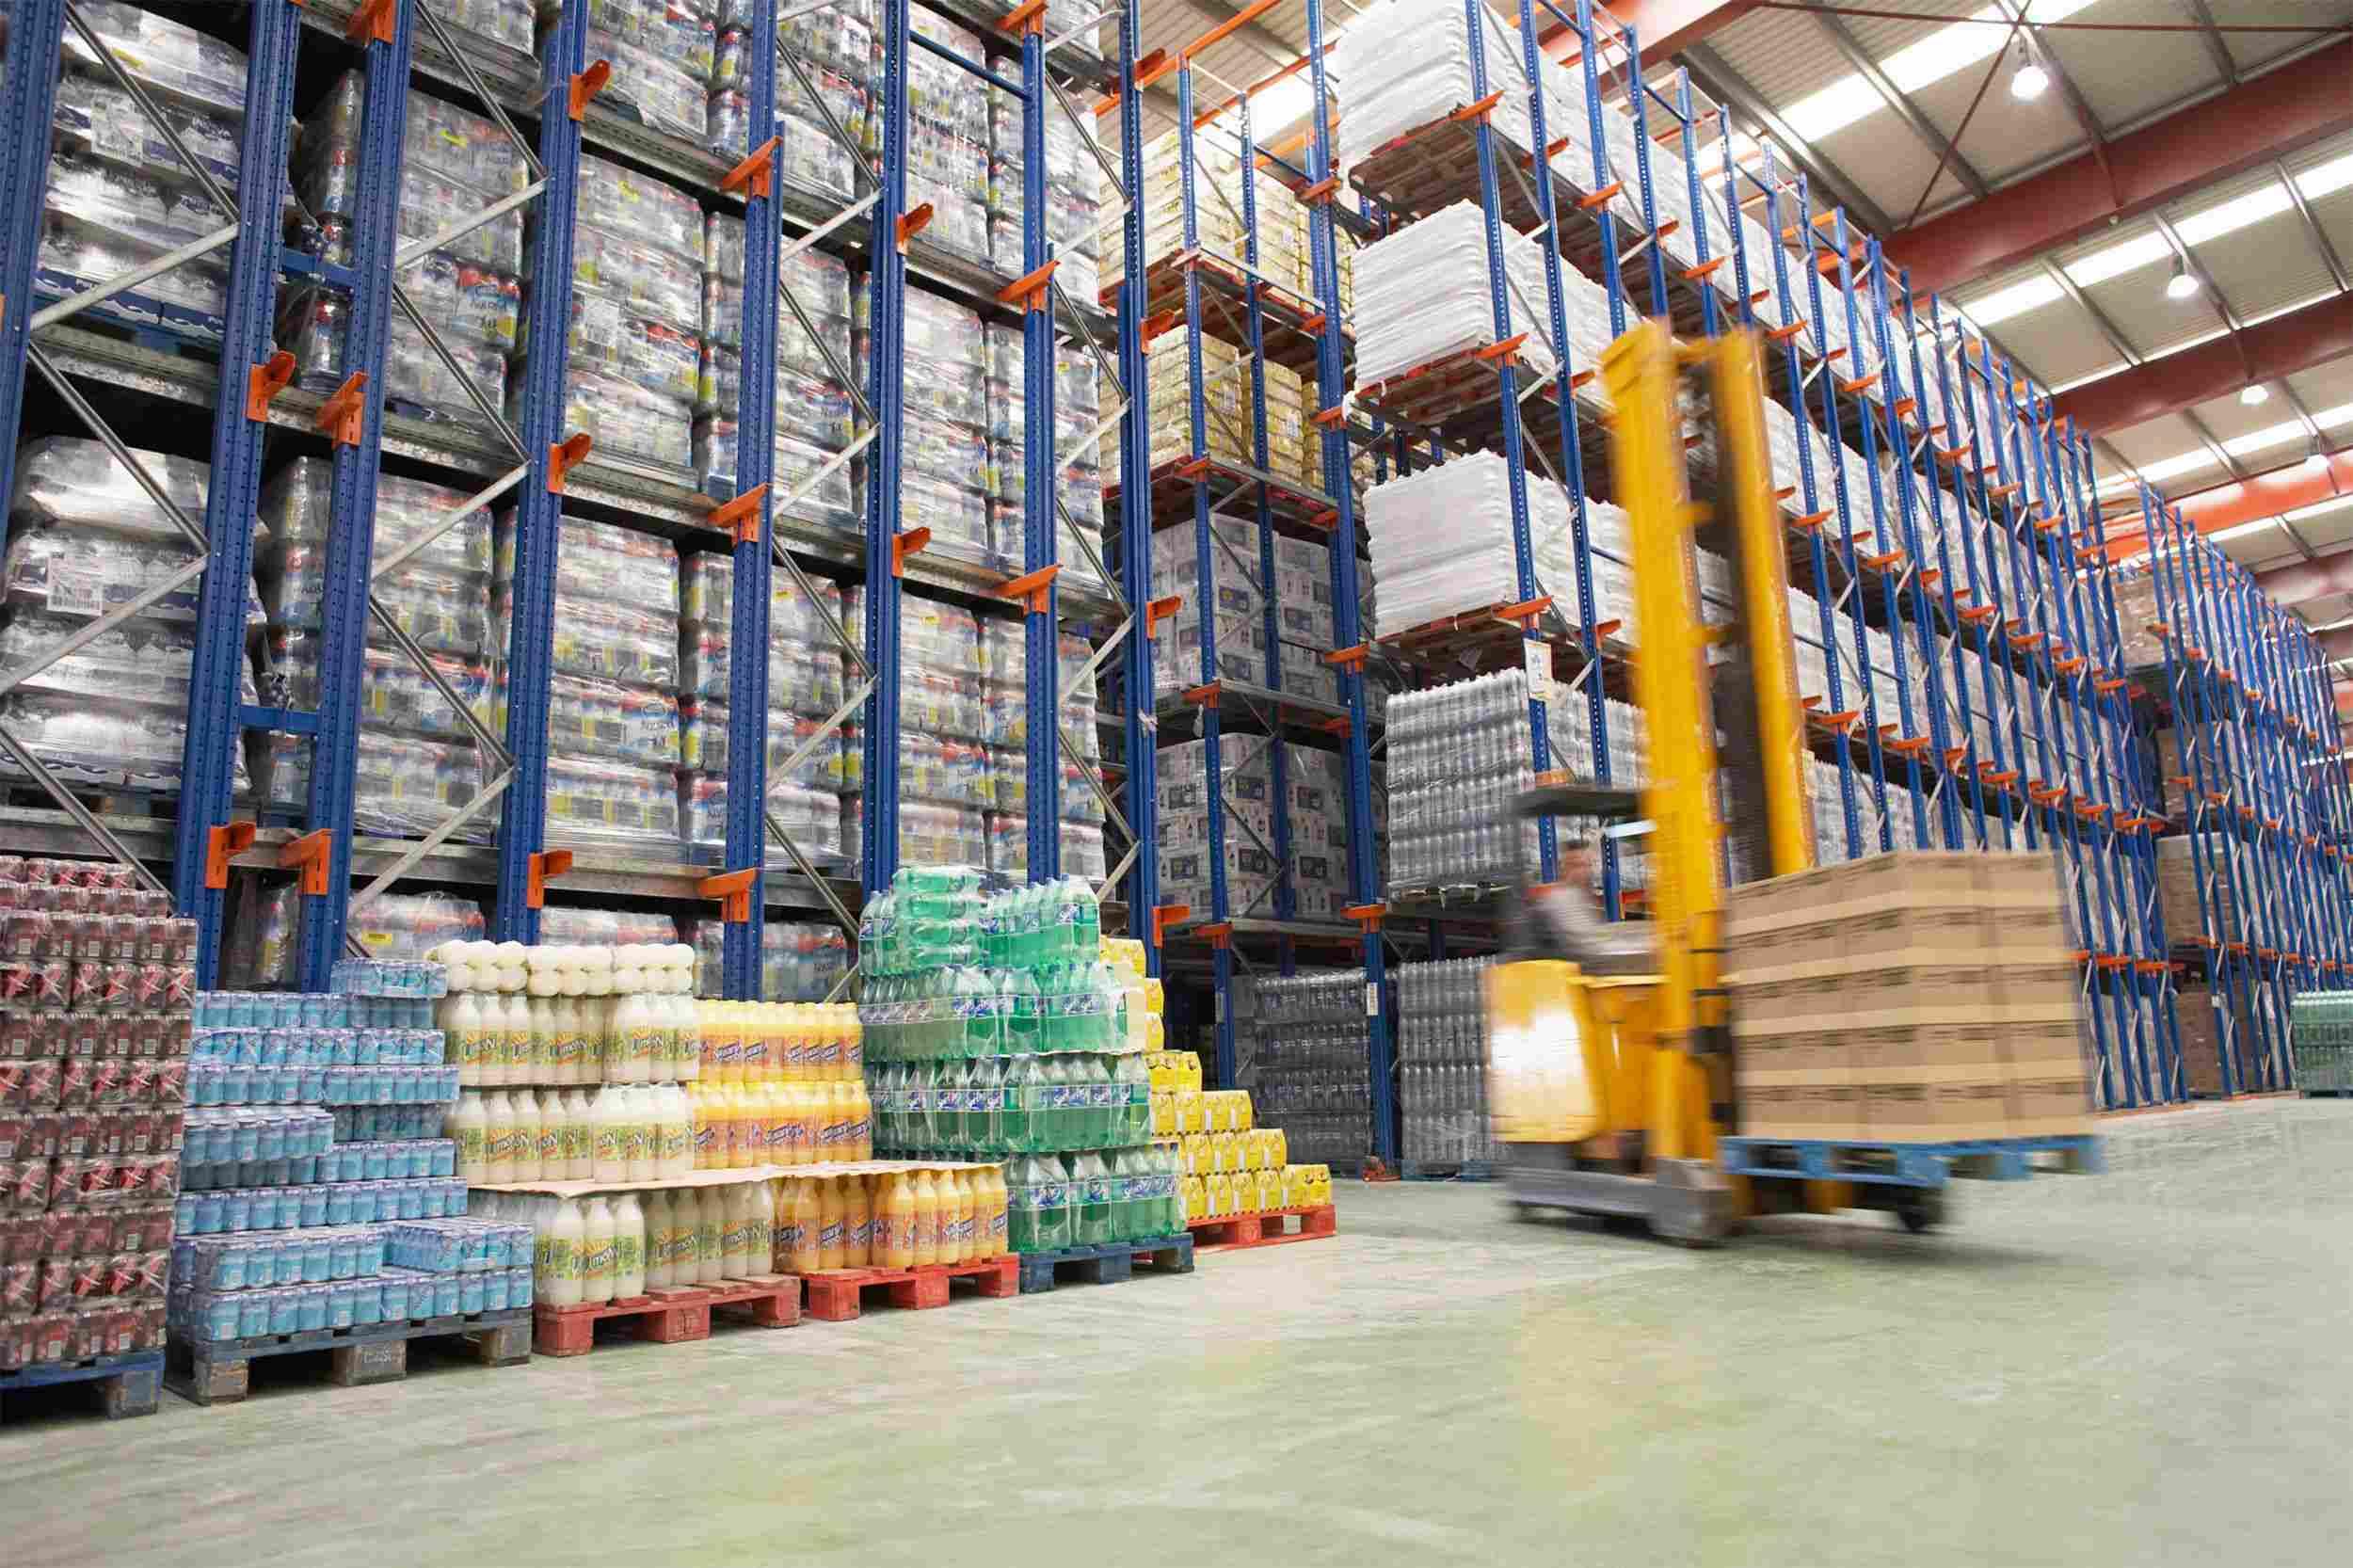 https://www.astellogistic.com/wp-content/uploads/2015/09/Warehouse-and-lifter.jpg